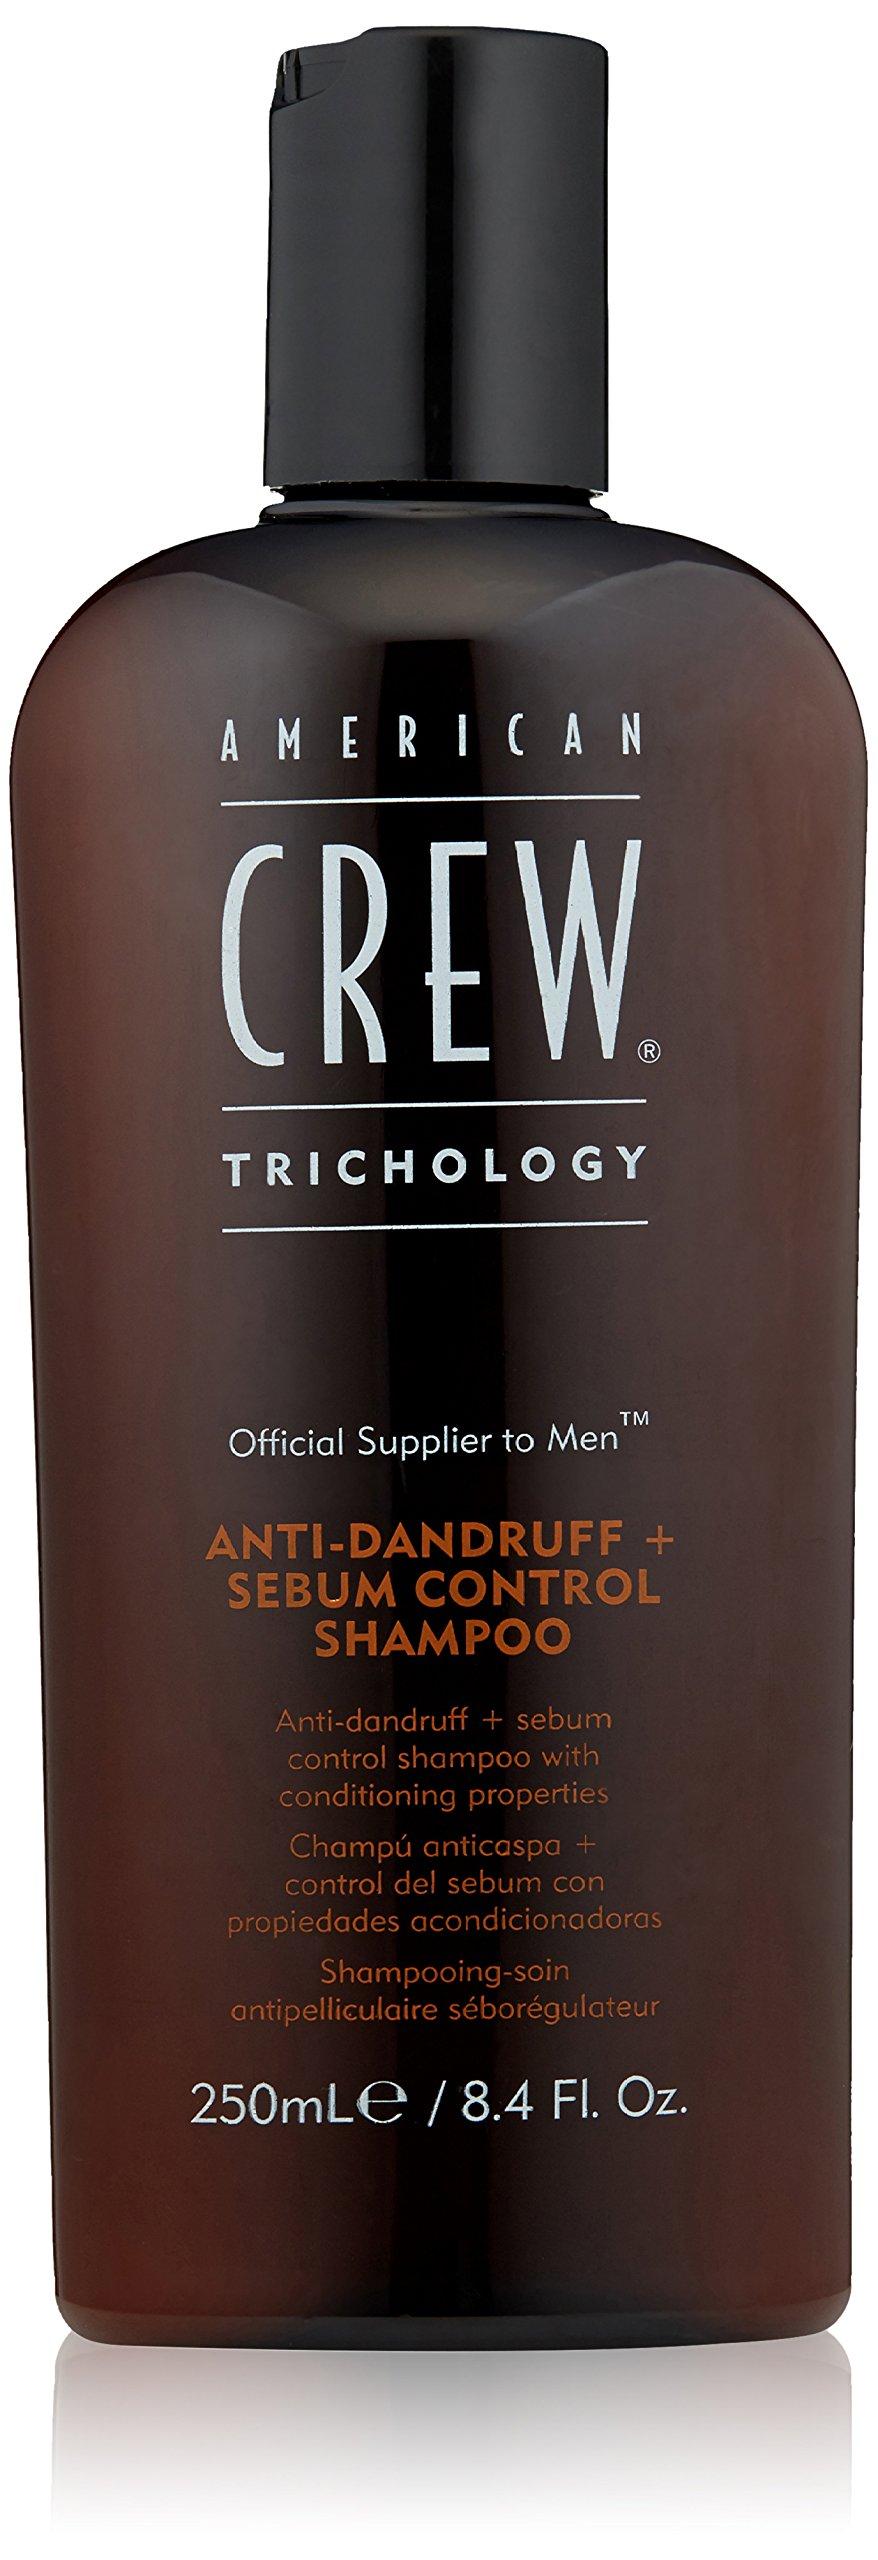 American Crew Anti-Dandruff Plus Sebum Control Shampoo, 8.4 Ounce